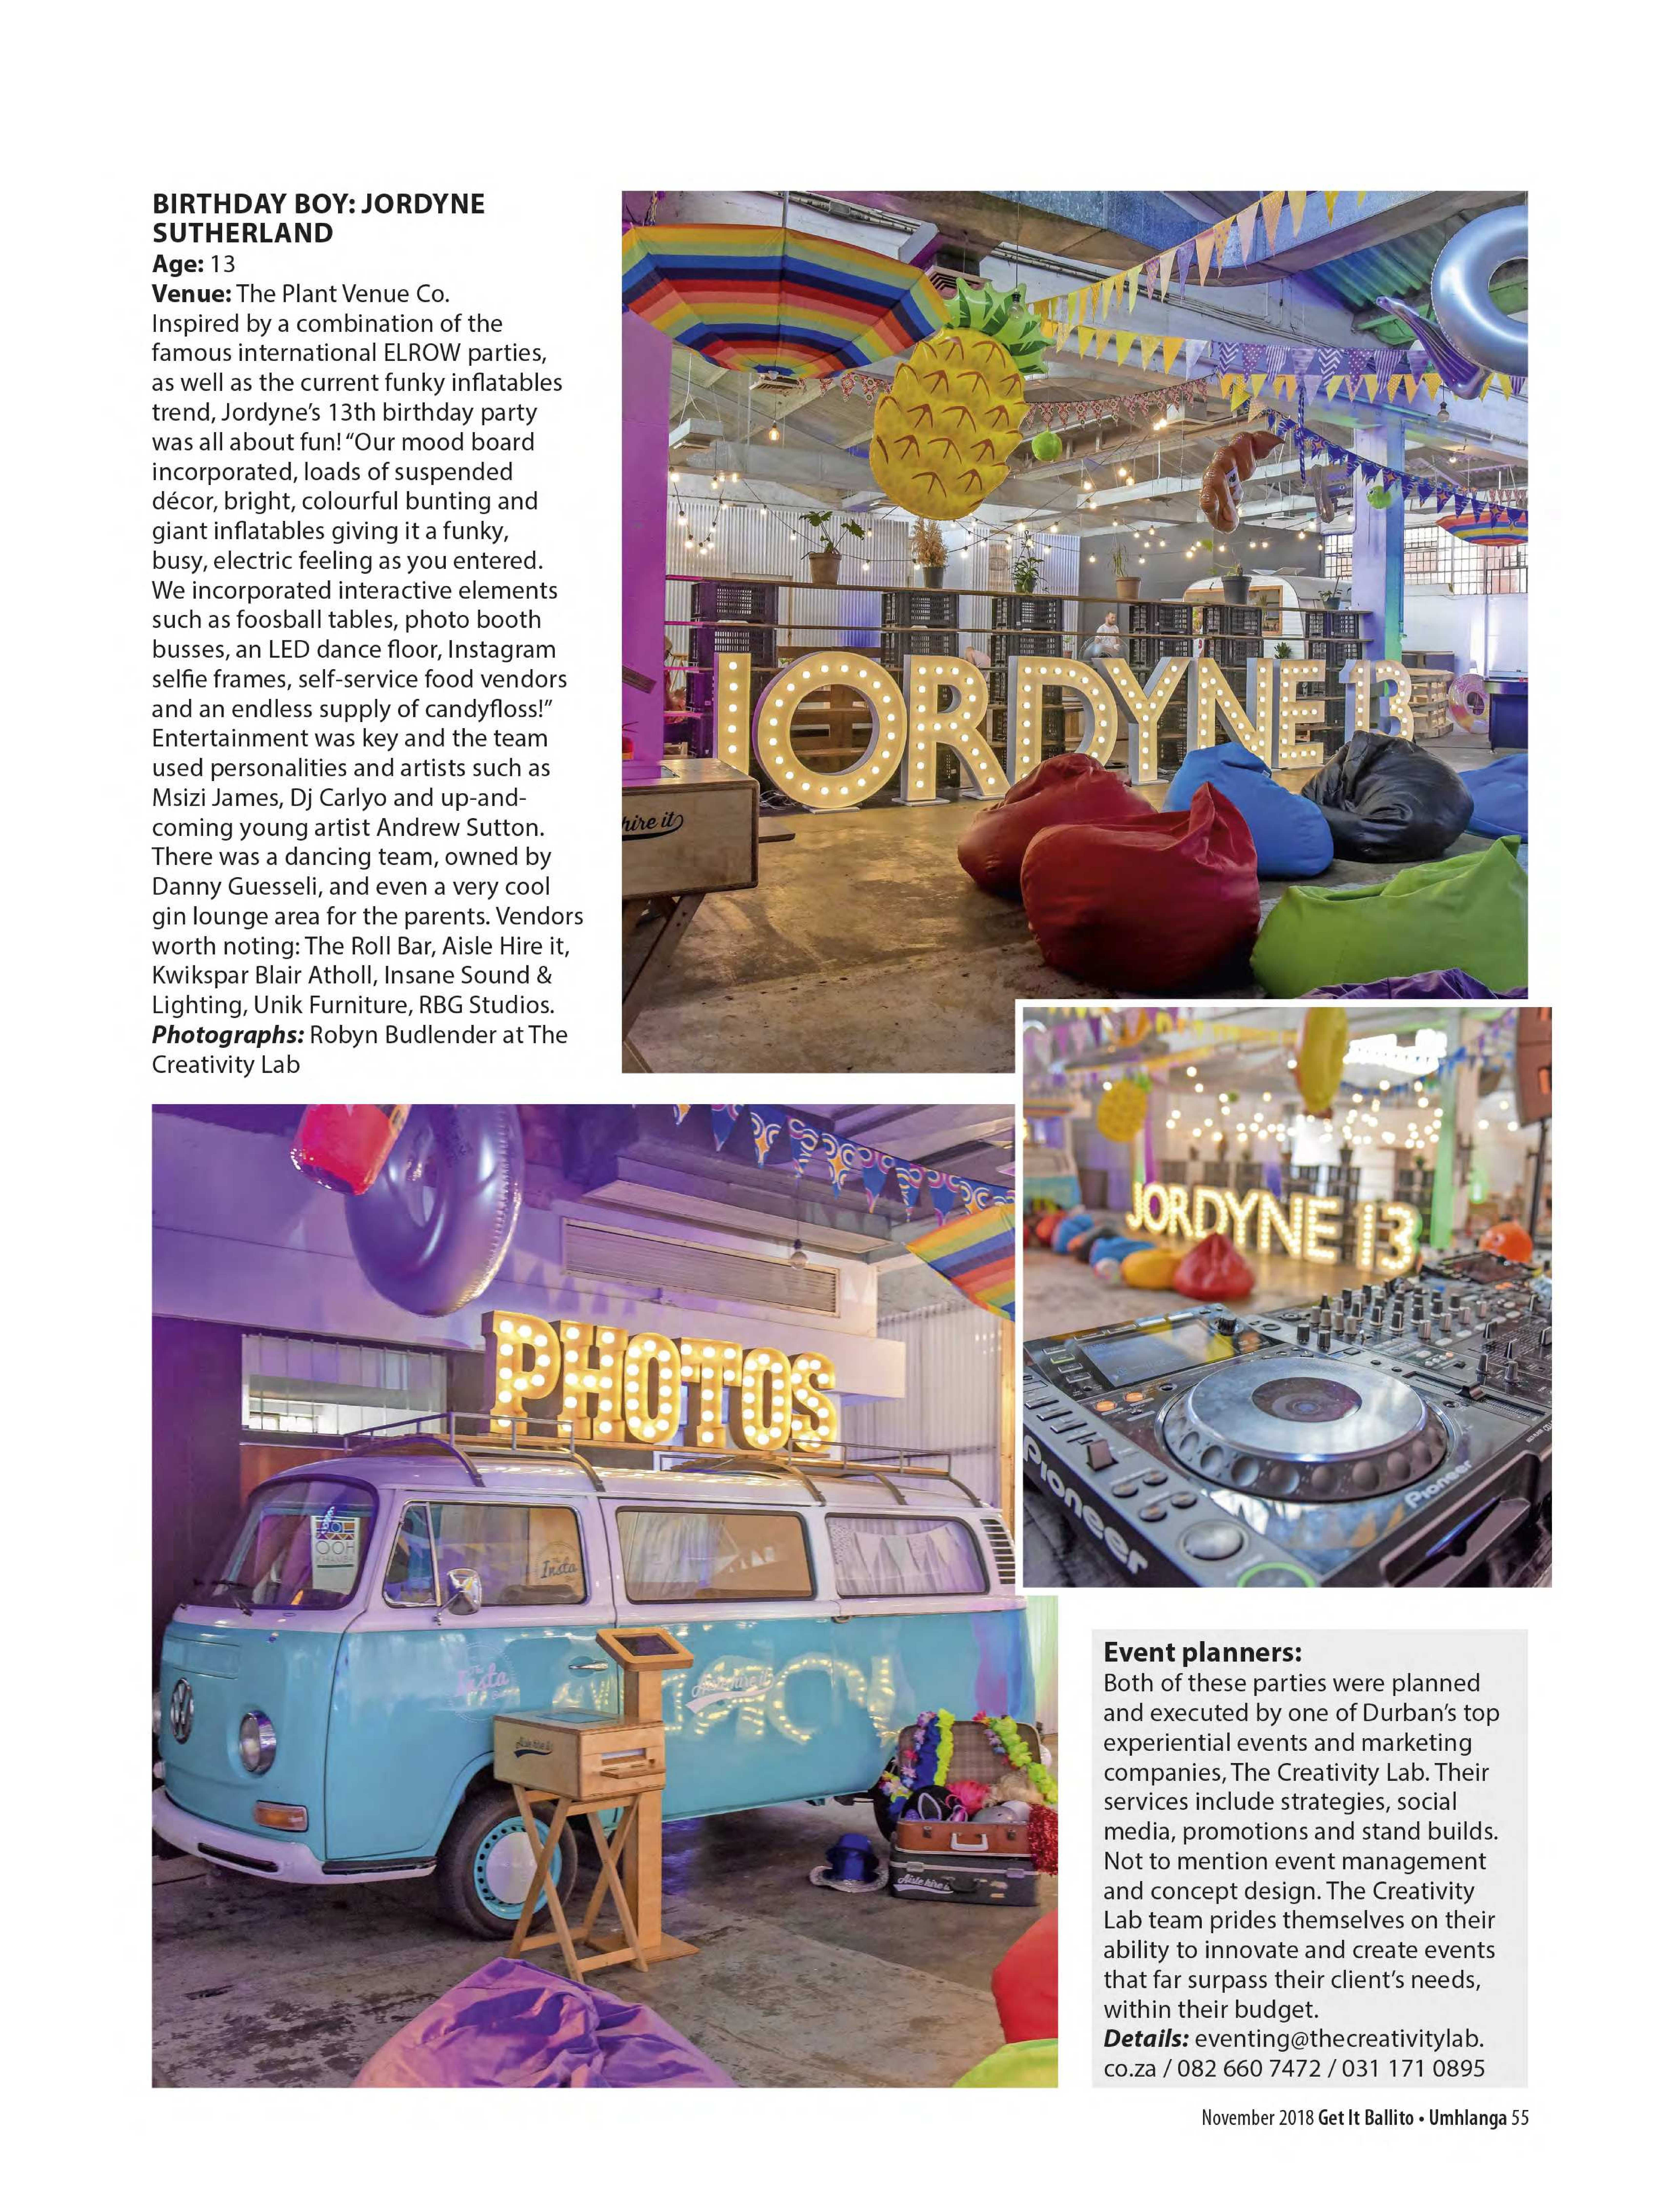 get-magazine-ballitoumhlanga-november-2018-epapers-page-57